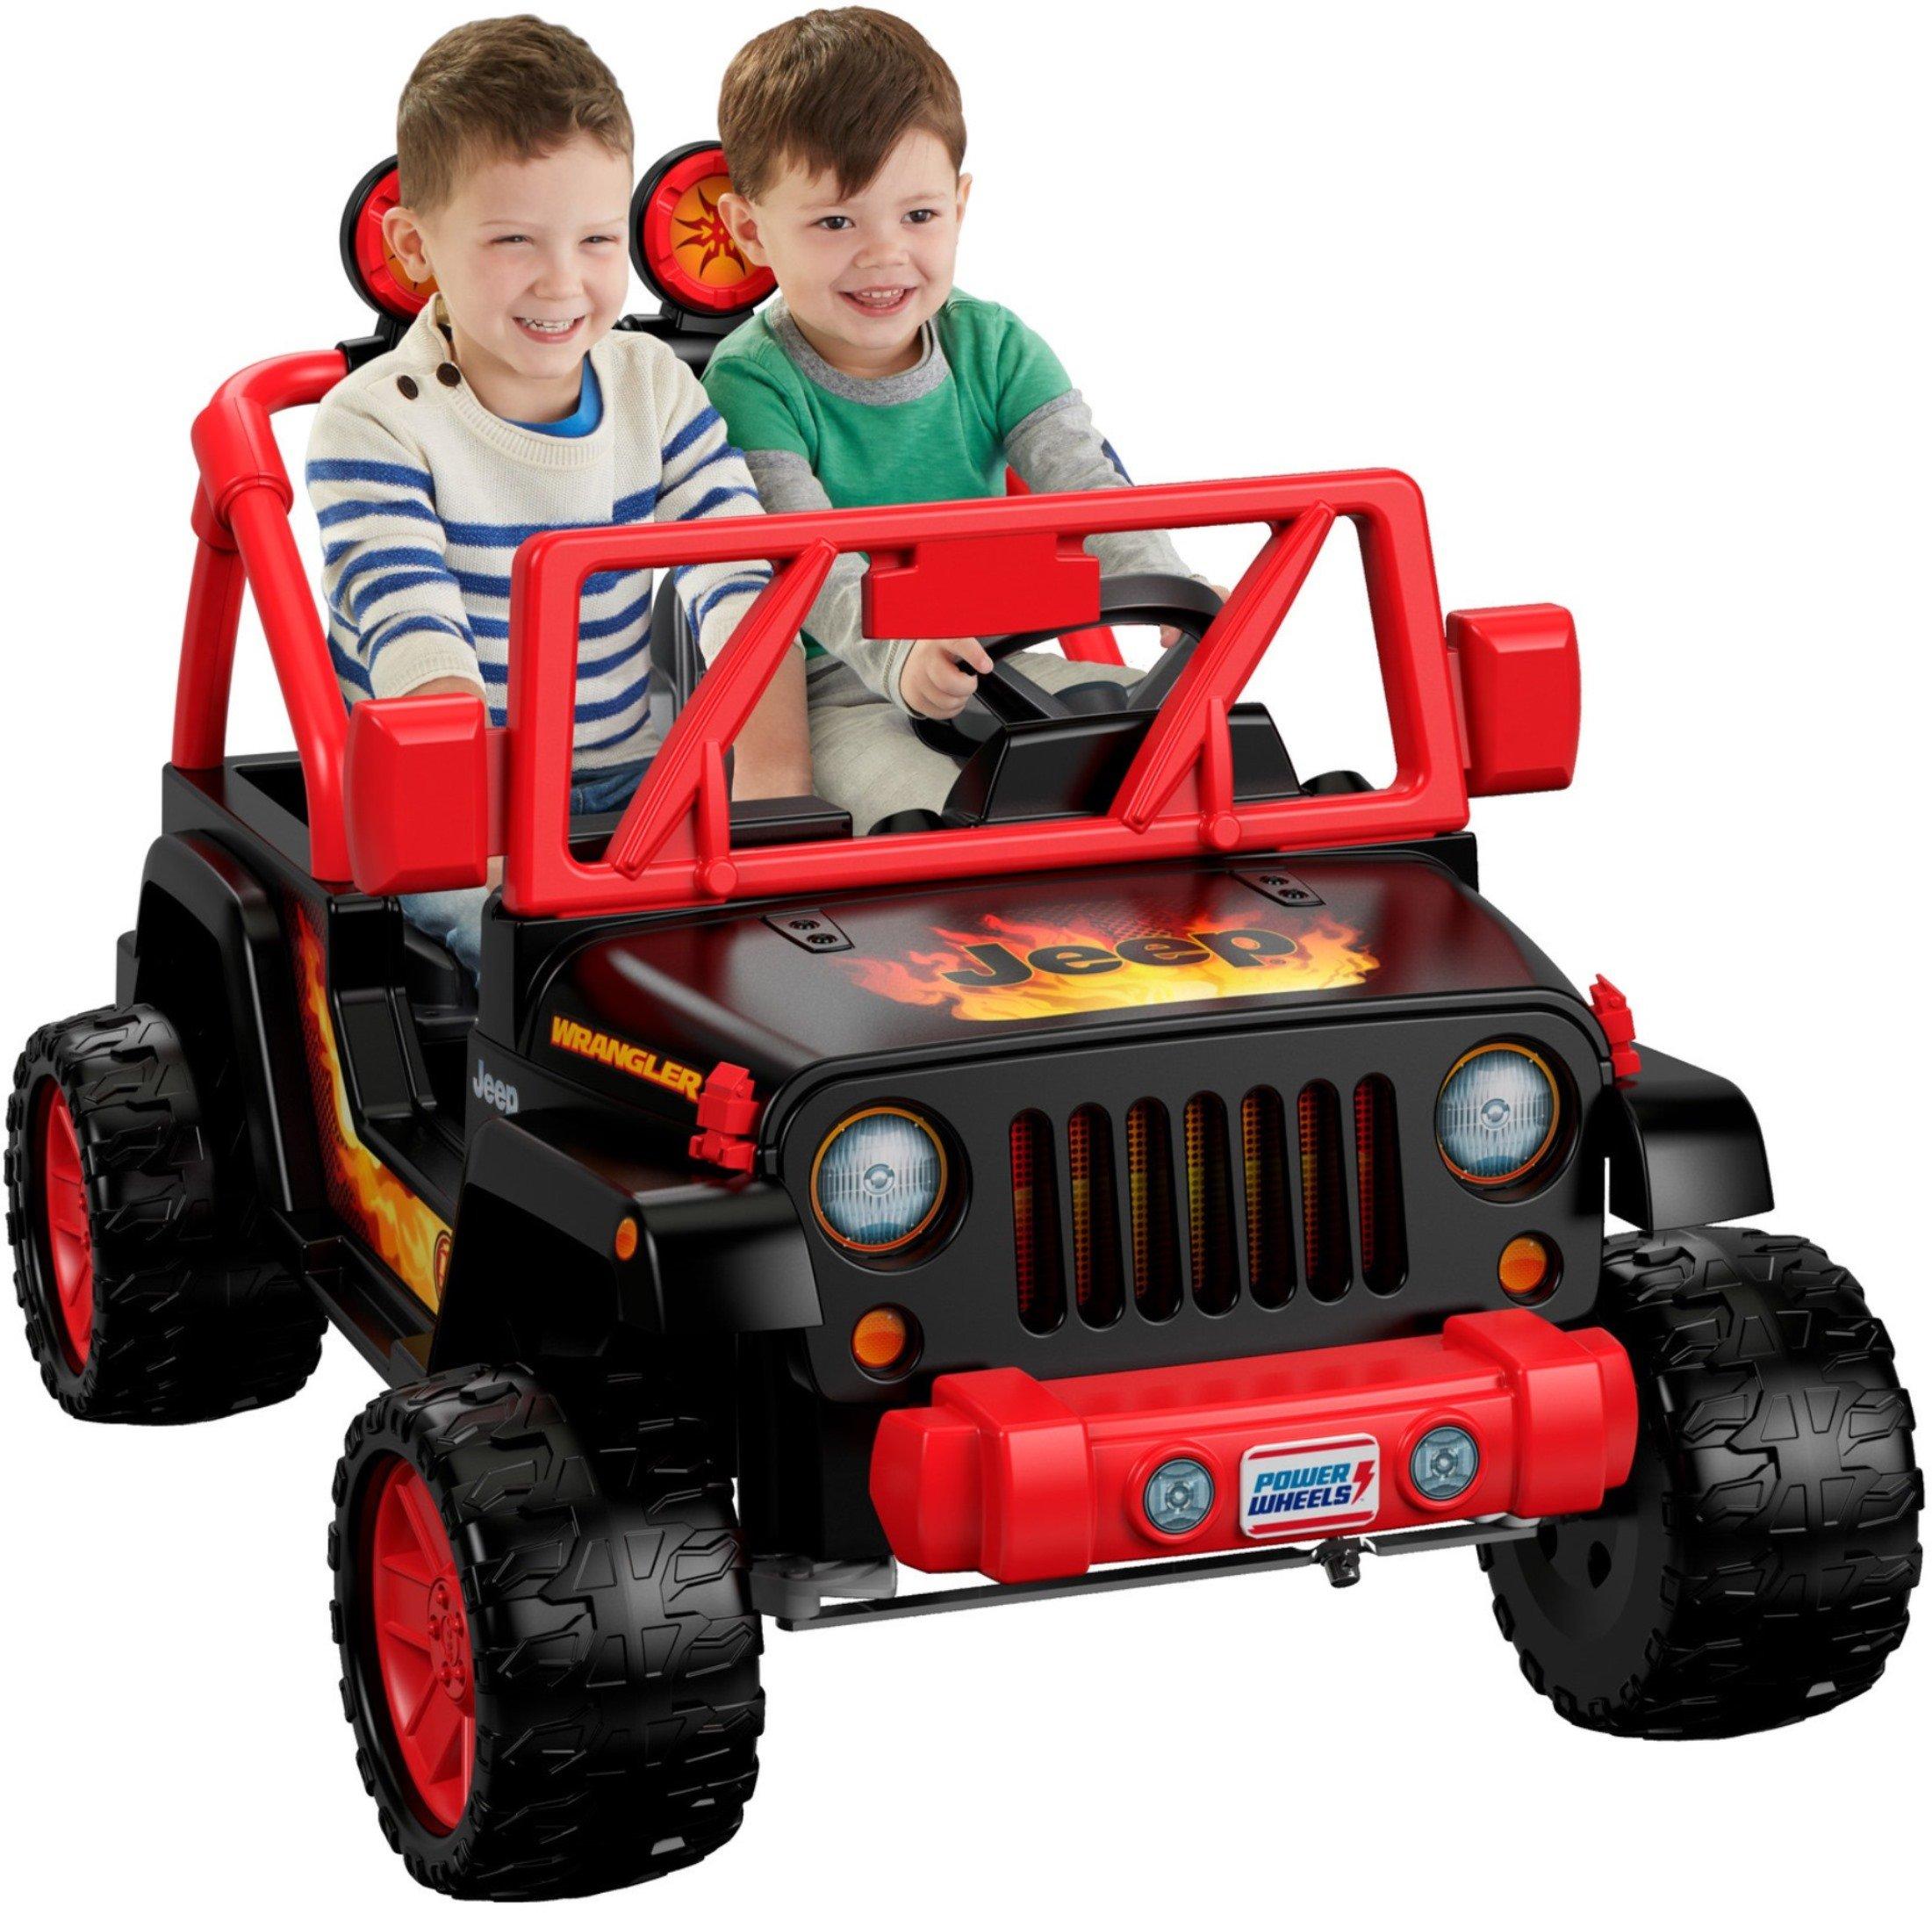 Fisher-Price Power Wheels Tough Talking Jeep Wrangler